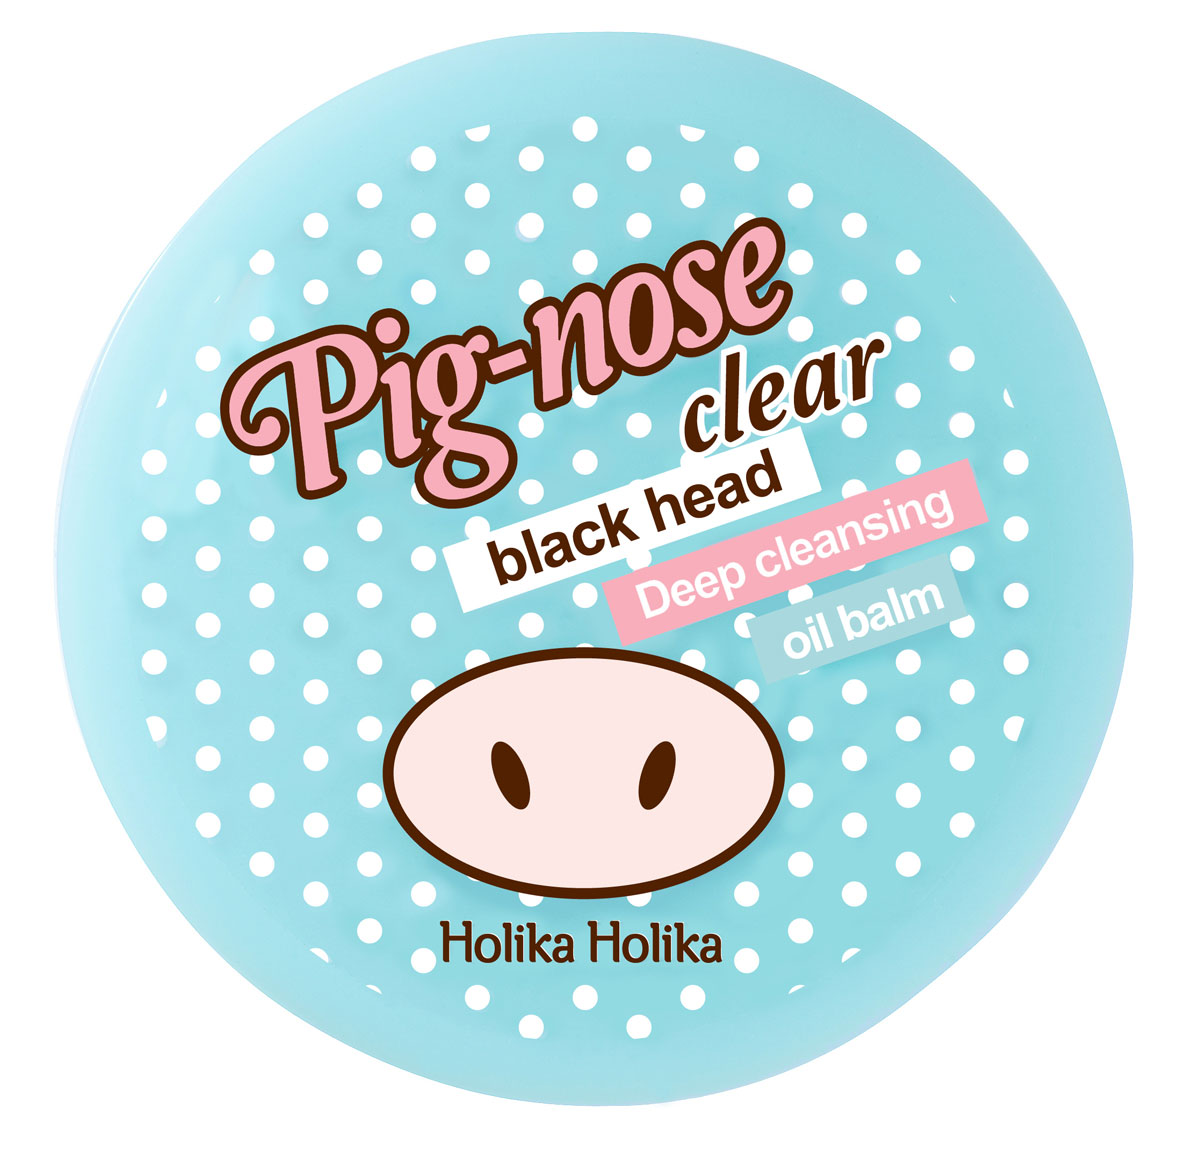 Holika Holika Бальзам Pig-nose для очистки пор, 30 мл ночная маска holika holika honey sleeping pack canola объем 90 мл